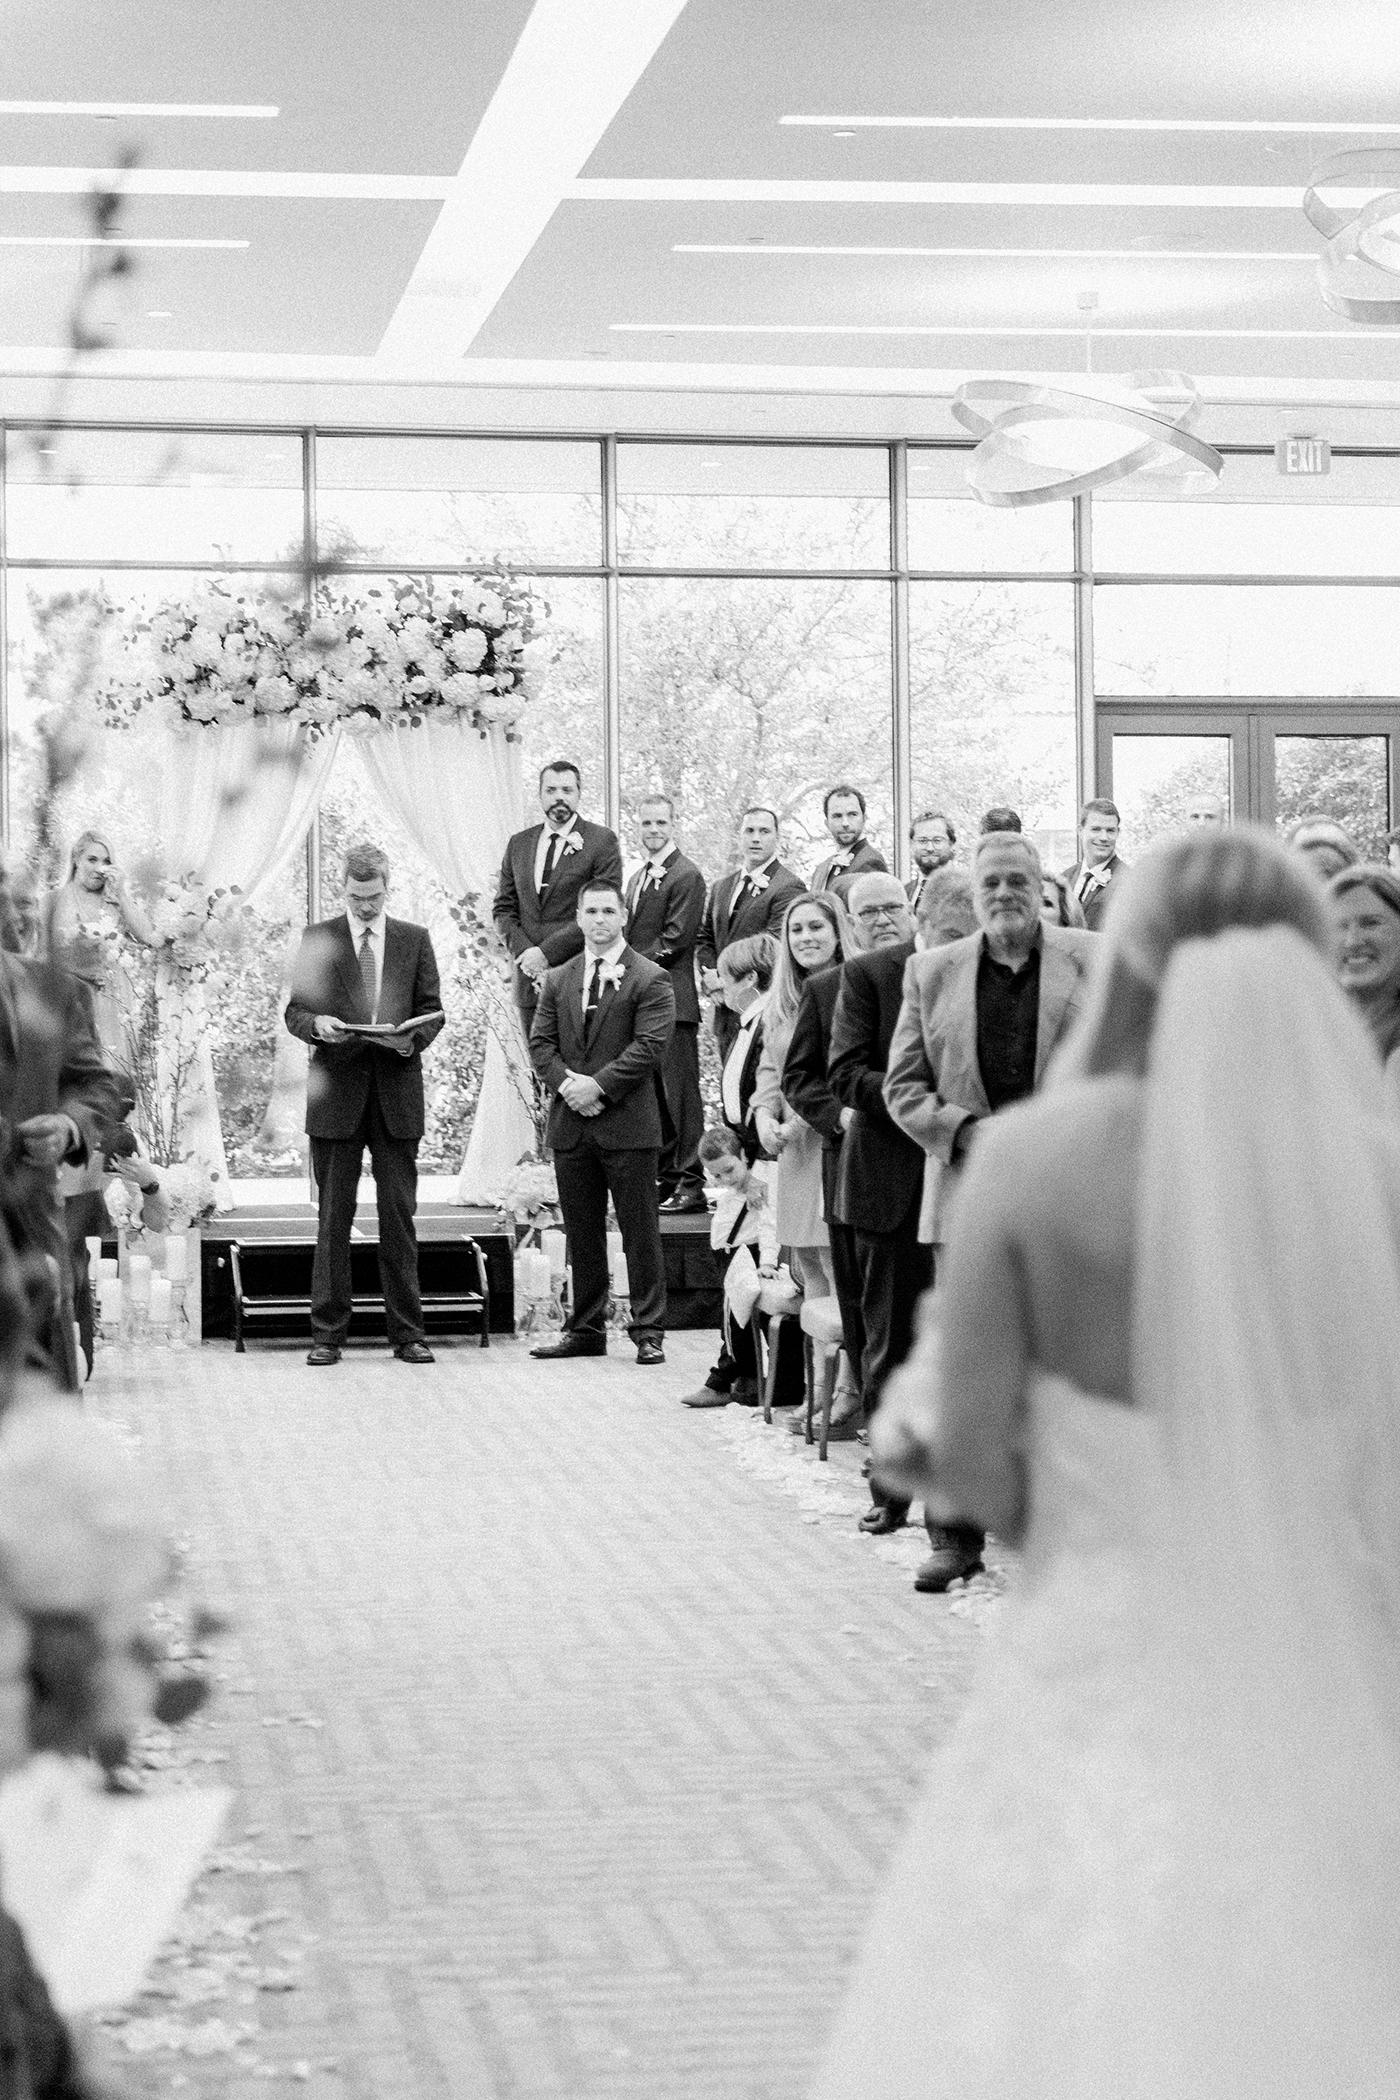 DFW Wedding Planner - Caroline + Jeff at The Four Seasons Hotel Wedding - Allday Events - 97.jpg